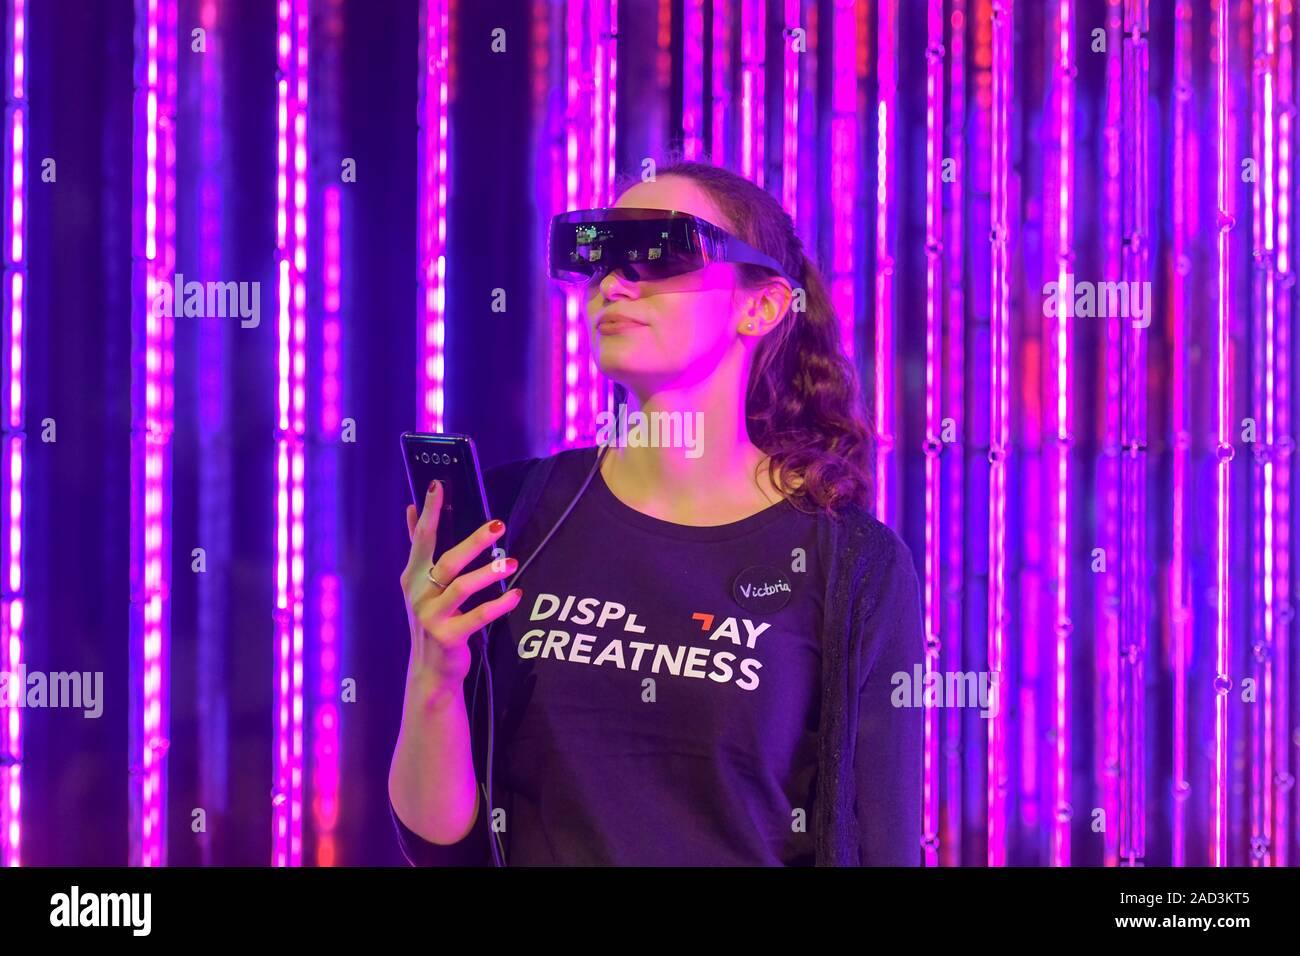 Datenbrille, TCL, Expérience Plex Internationale Funkaustellung, 2019 Berlin, Deutschland Banque D'Images